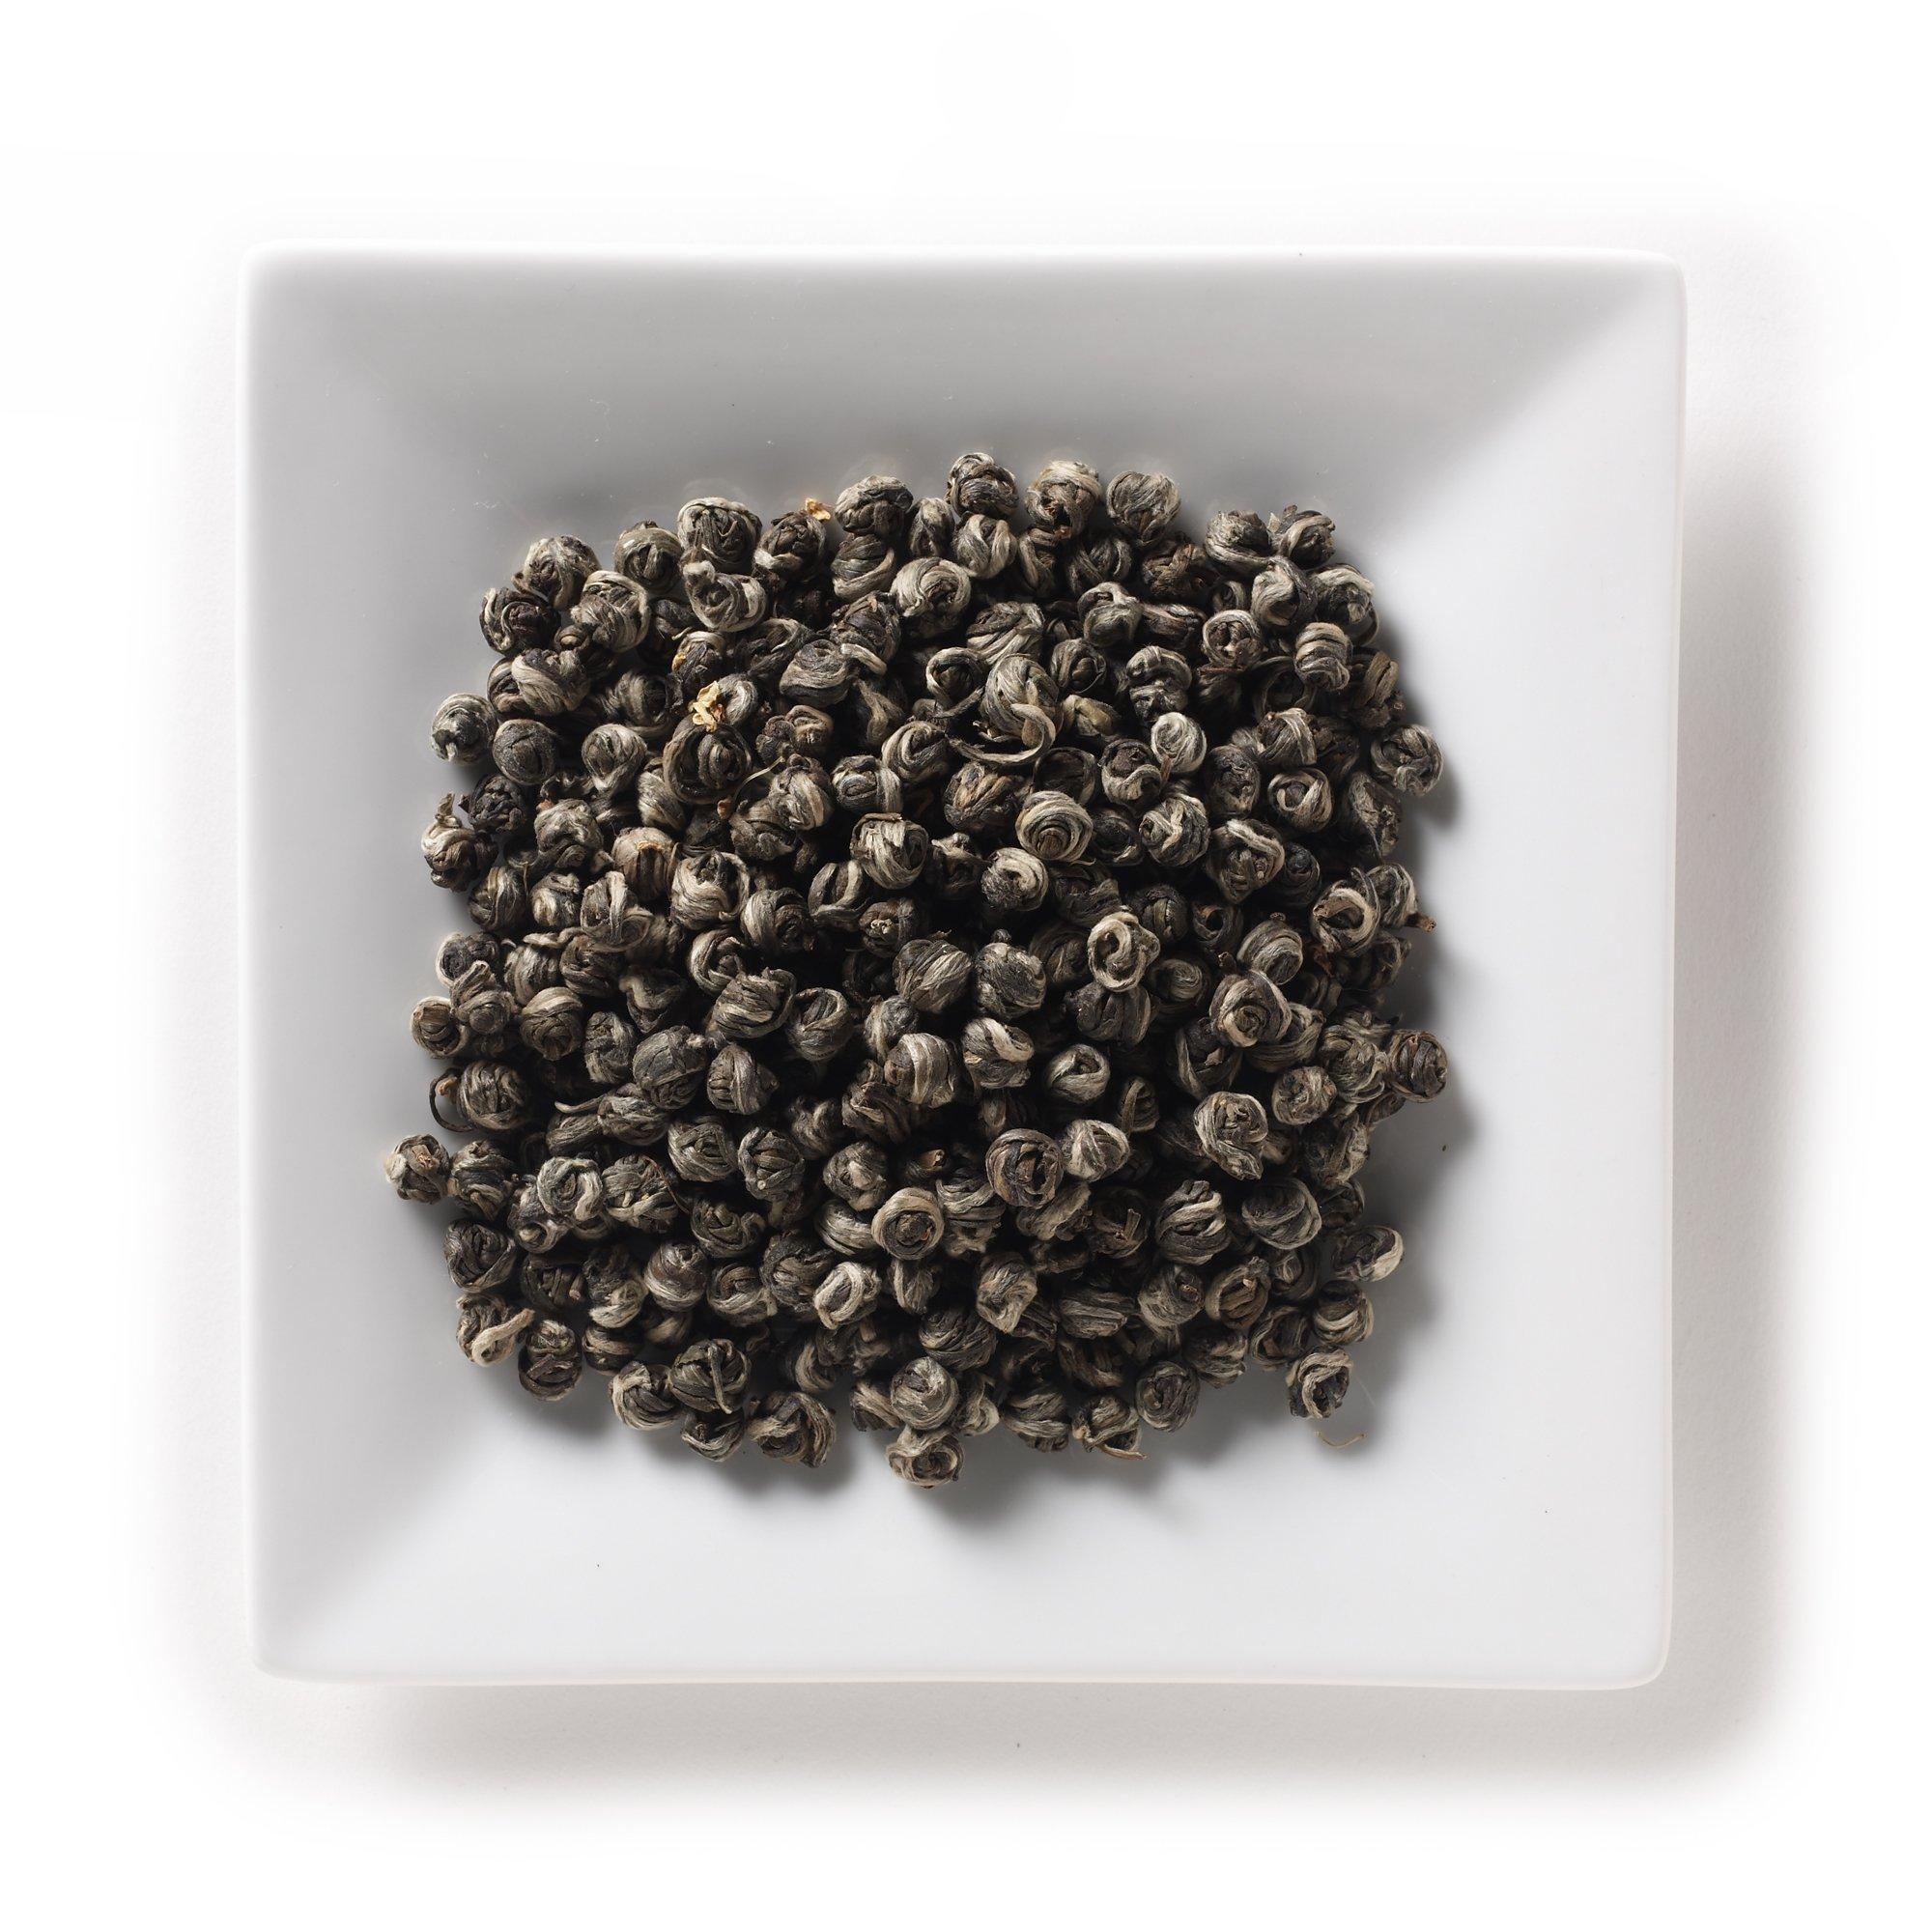 Mahamosa Flavored Green Tea Blend and Tea Infuser Set: 2 oz Osmanthus Dragon Pearls Green Tea, 1 Stainless Steel Tea Ball Infuser (Bundle- 2 items)